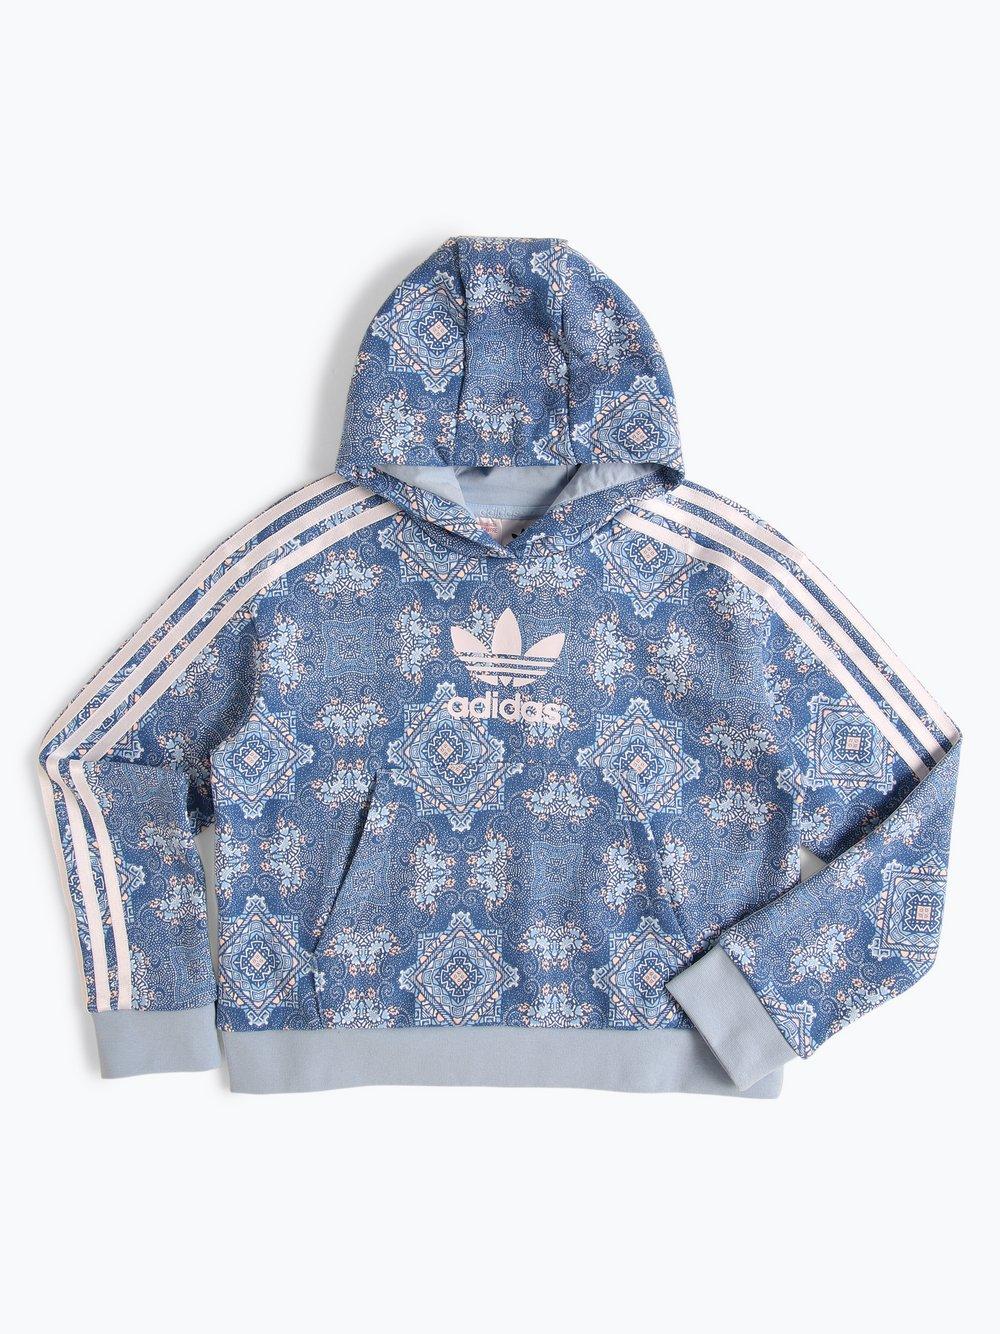 adidas coole schuhe, Adidas originals sweatjacke essentials